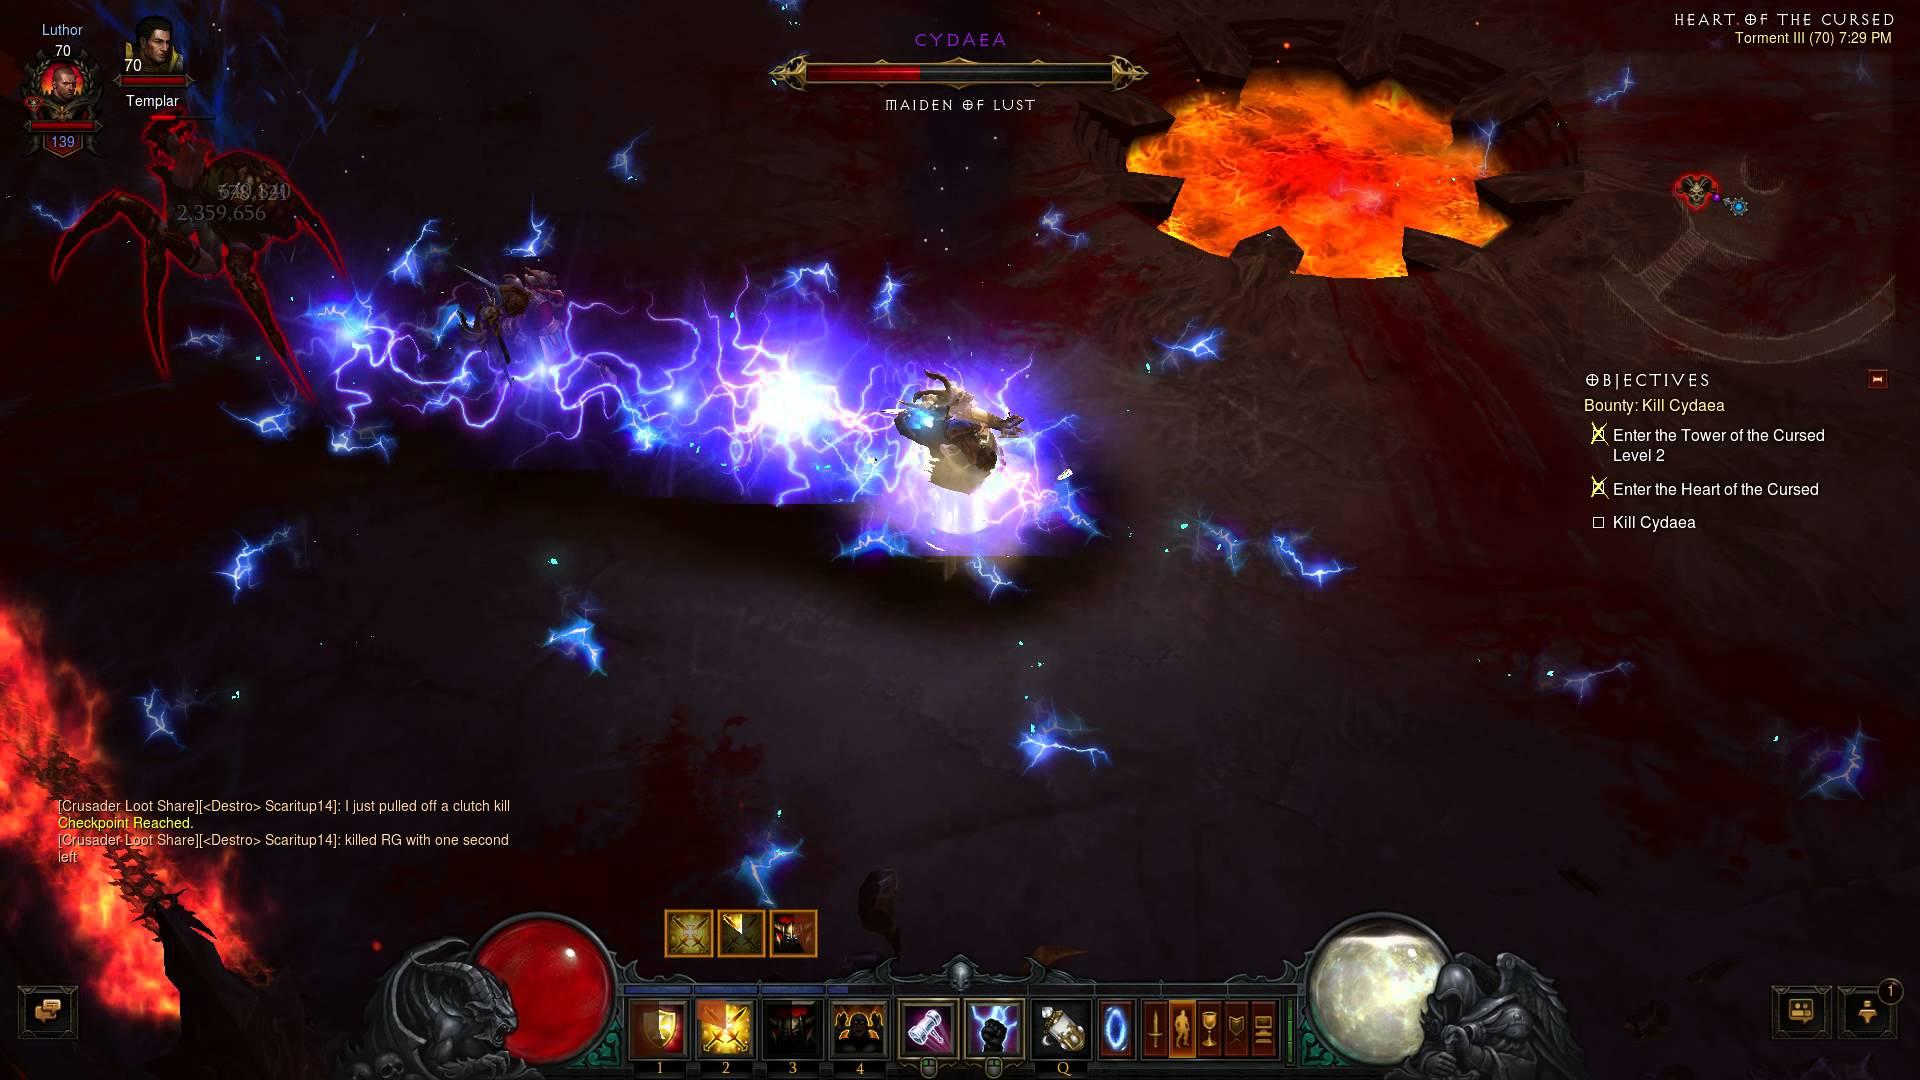 Diablo III – Cydaea Smackdown